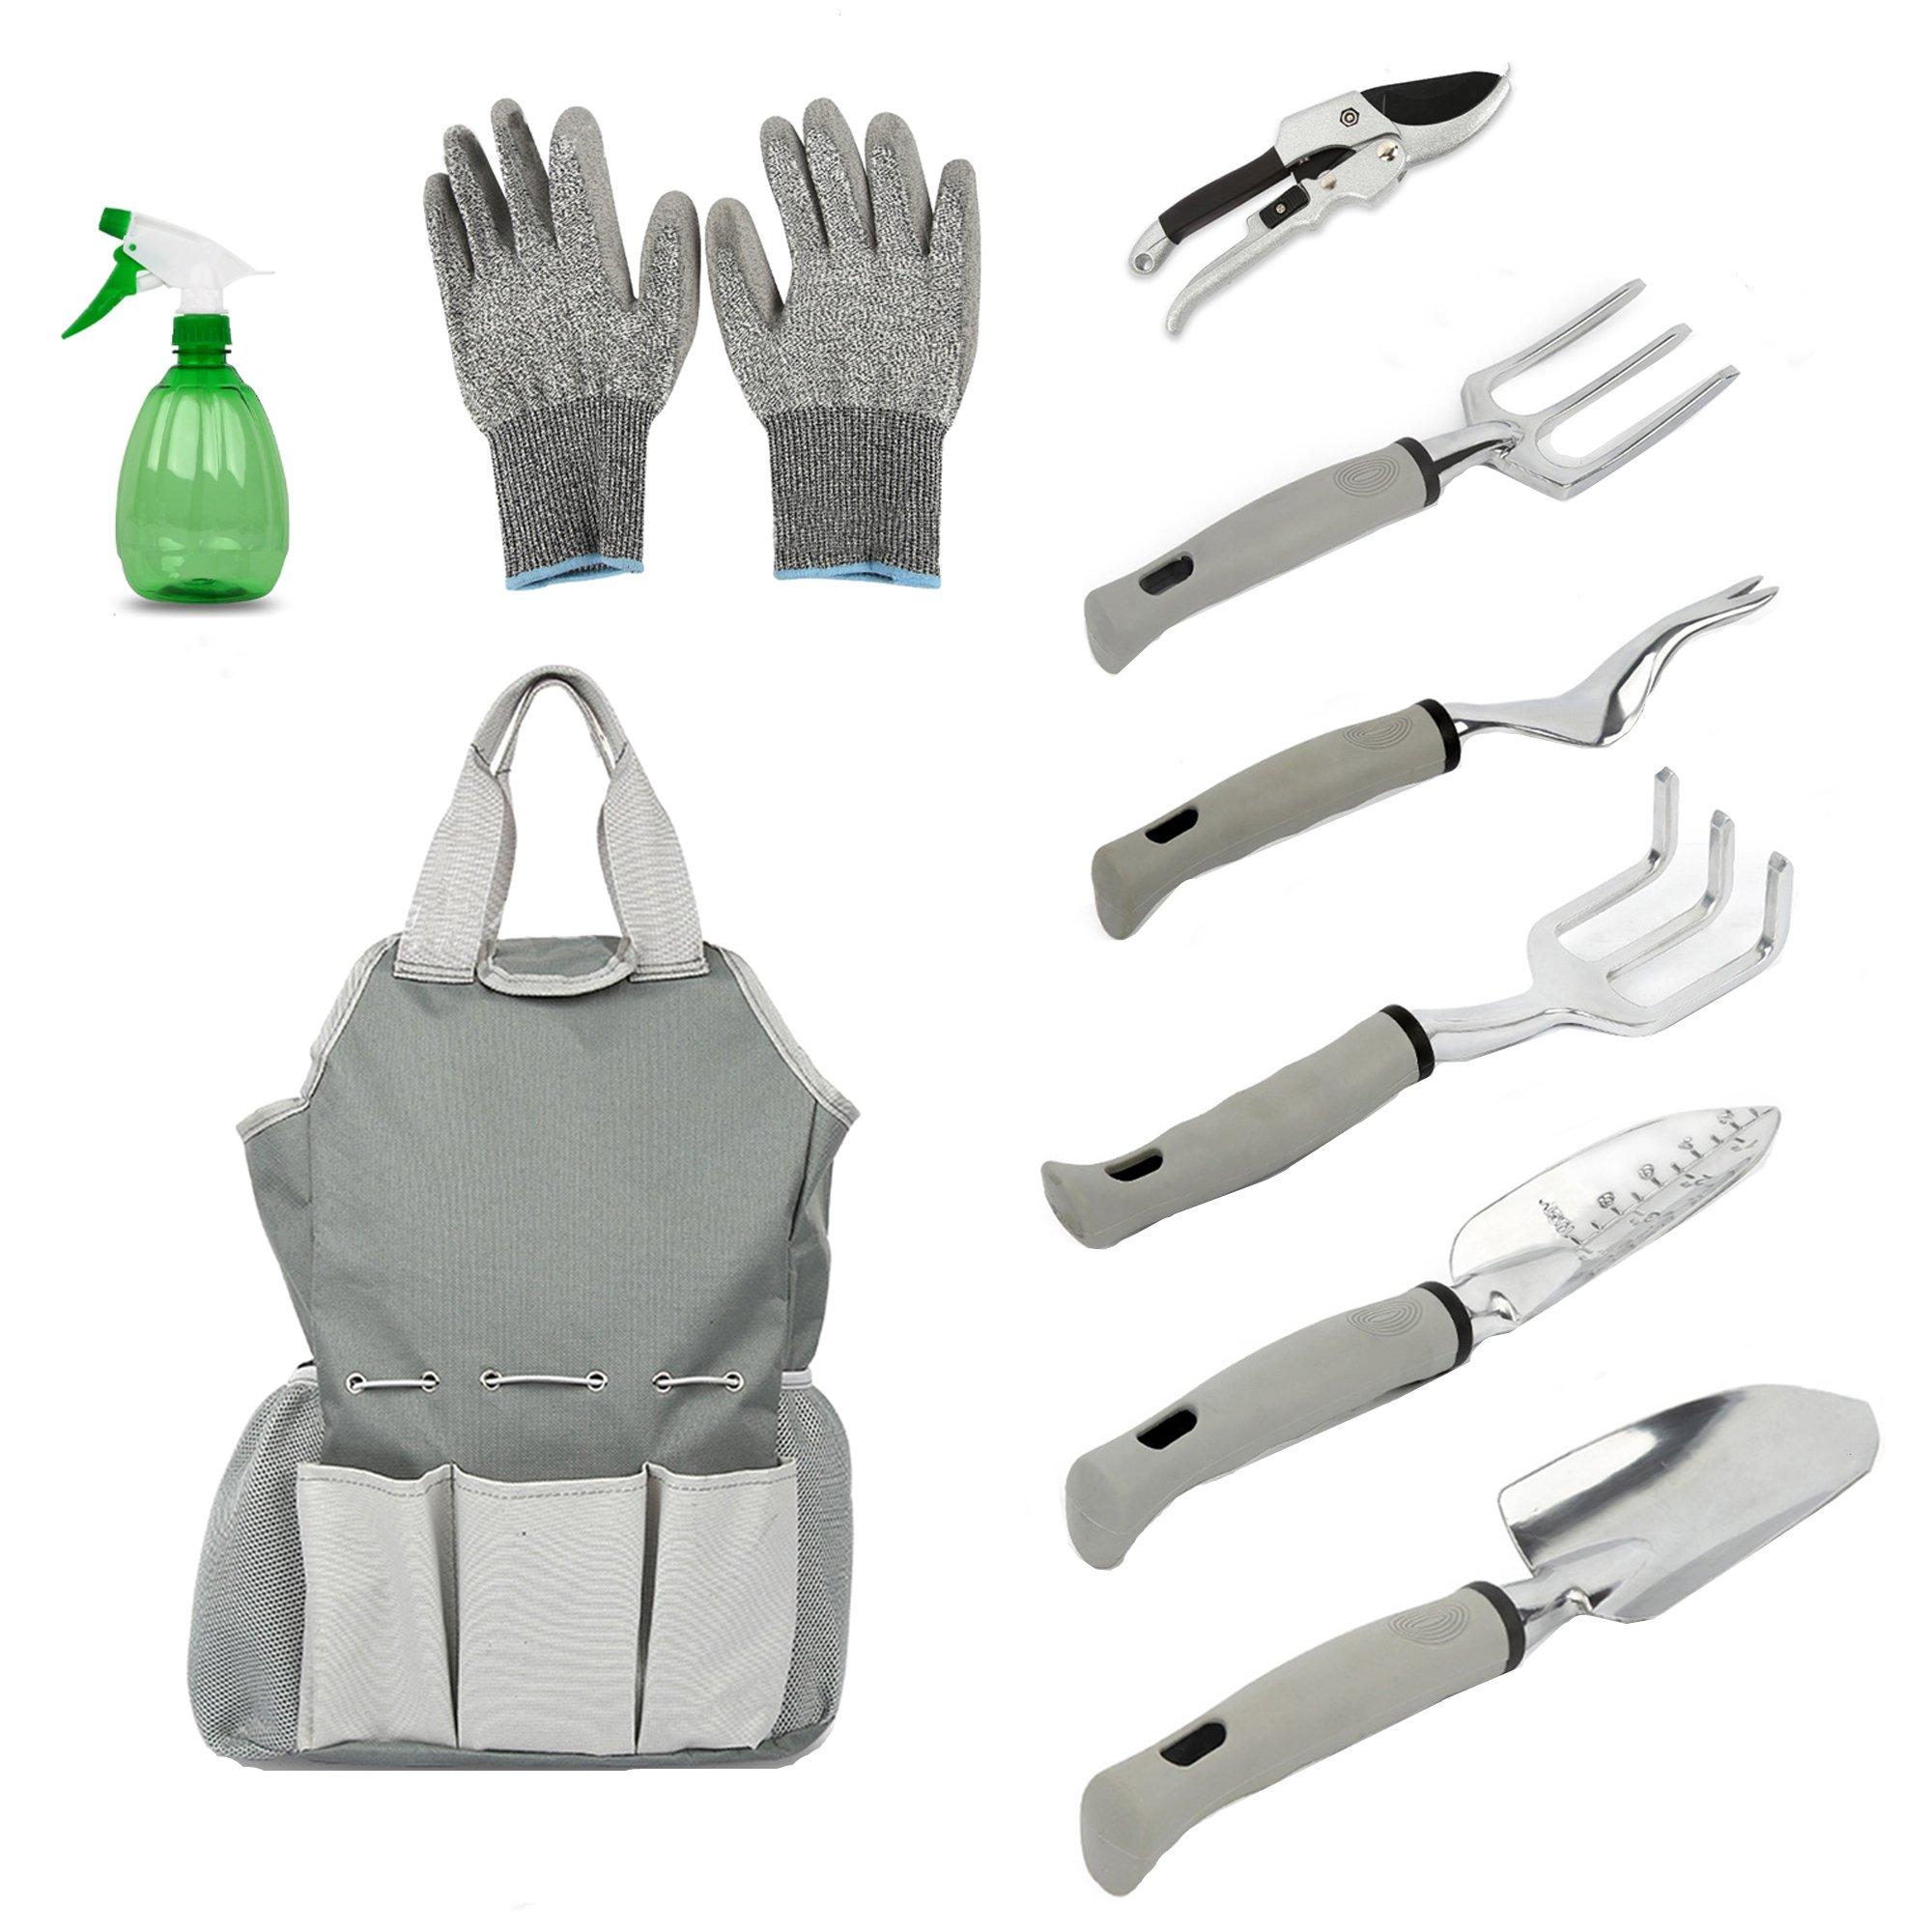 9Pcs Planting Hand Tool Set with Storage Bag